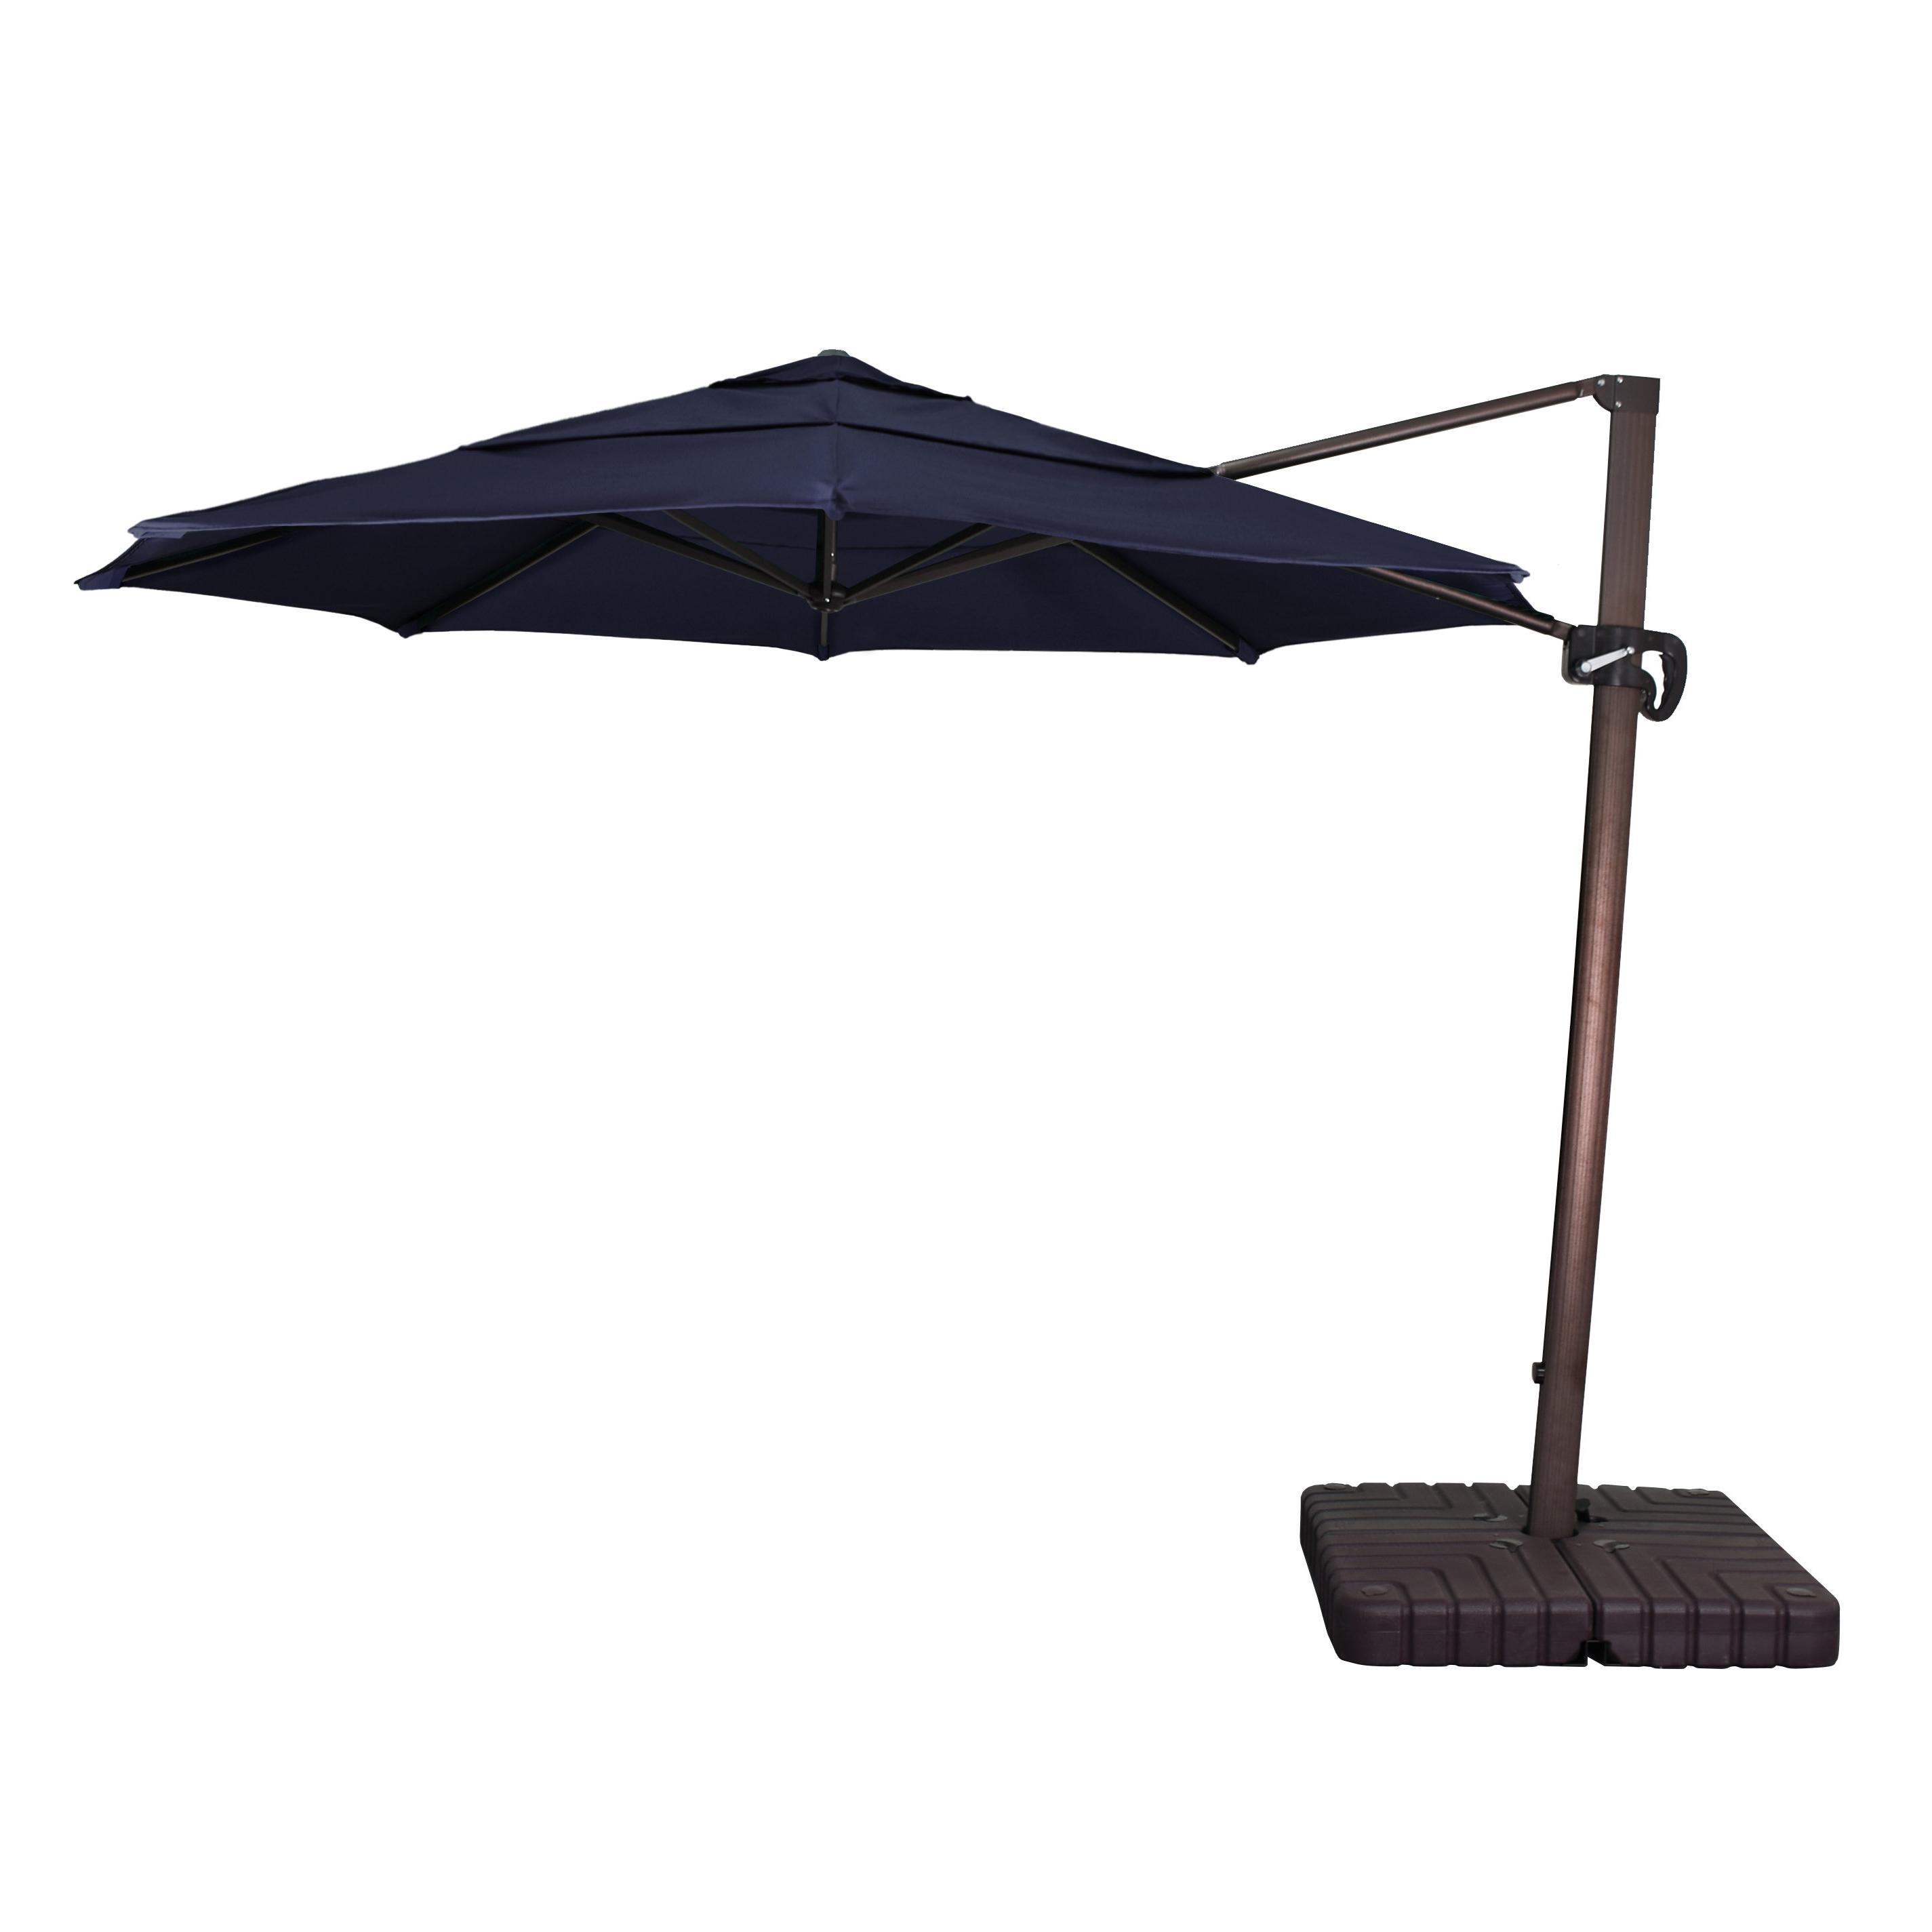 Bondi Square Cantilever Umbrellas With Regard To Most Popular Carlisle 11' Cantilever Sunbrella Umbrella (View 17 of 20)